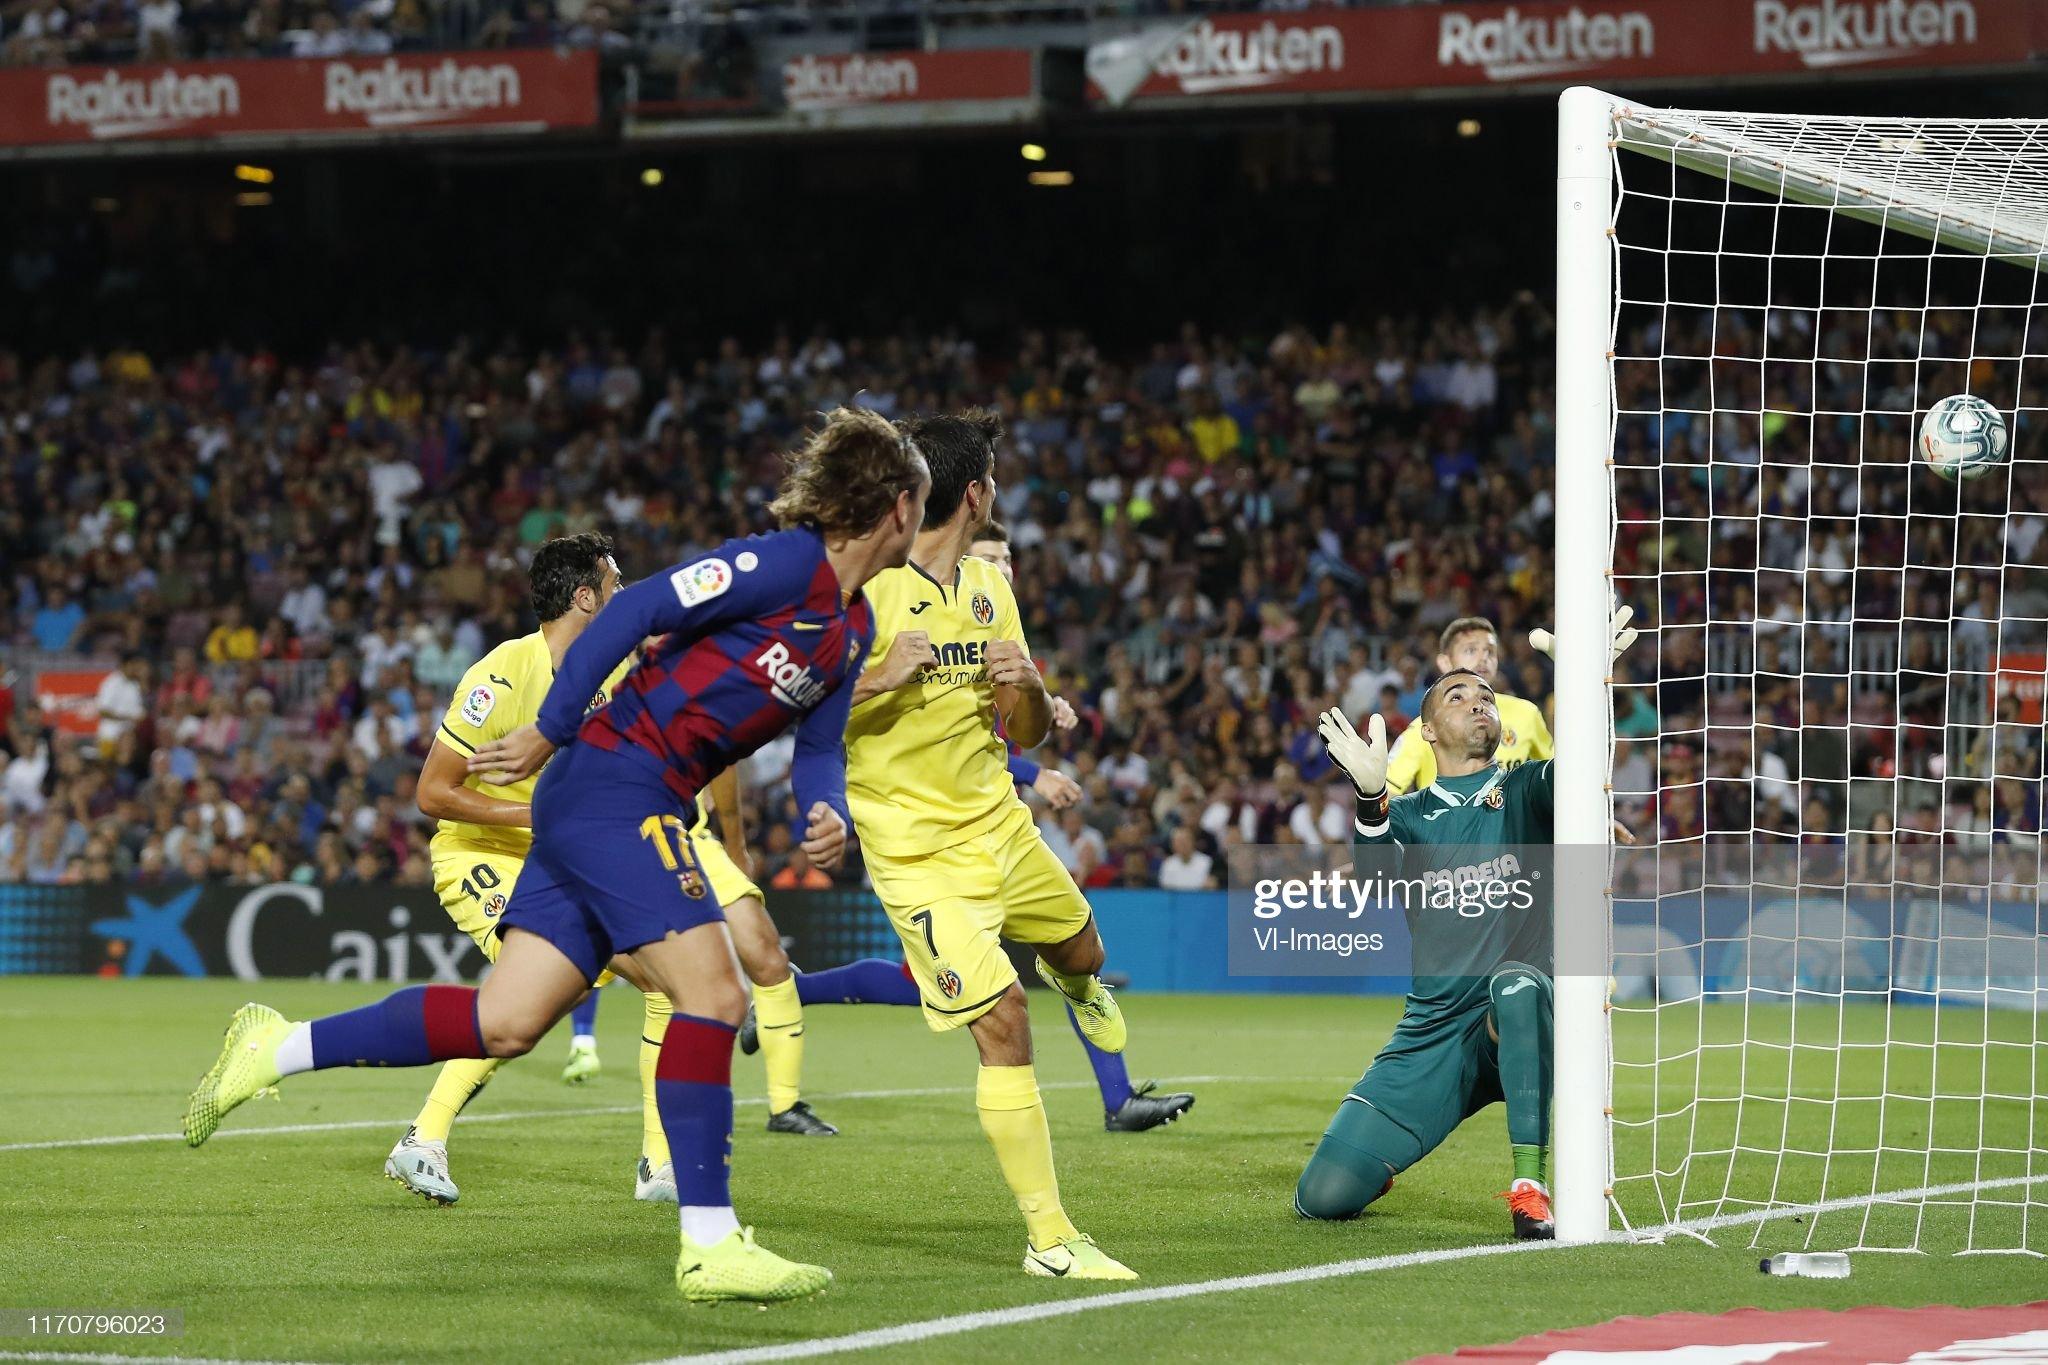 صور مباراة : برشلونة - فياريال 2-1 ( 24-09-2019 )  Vicente-iborra-of-villarreal-cf-antoine-griezmann-of-fc-barcelona-picture-id1170796023?s=2048x2048